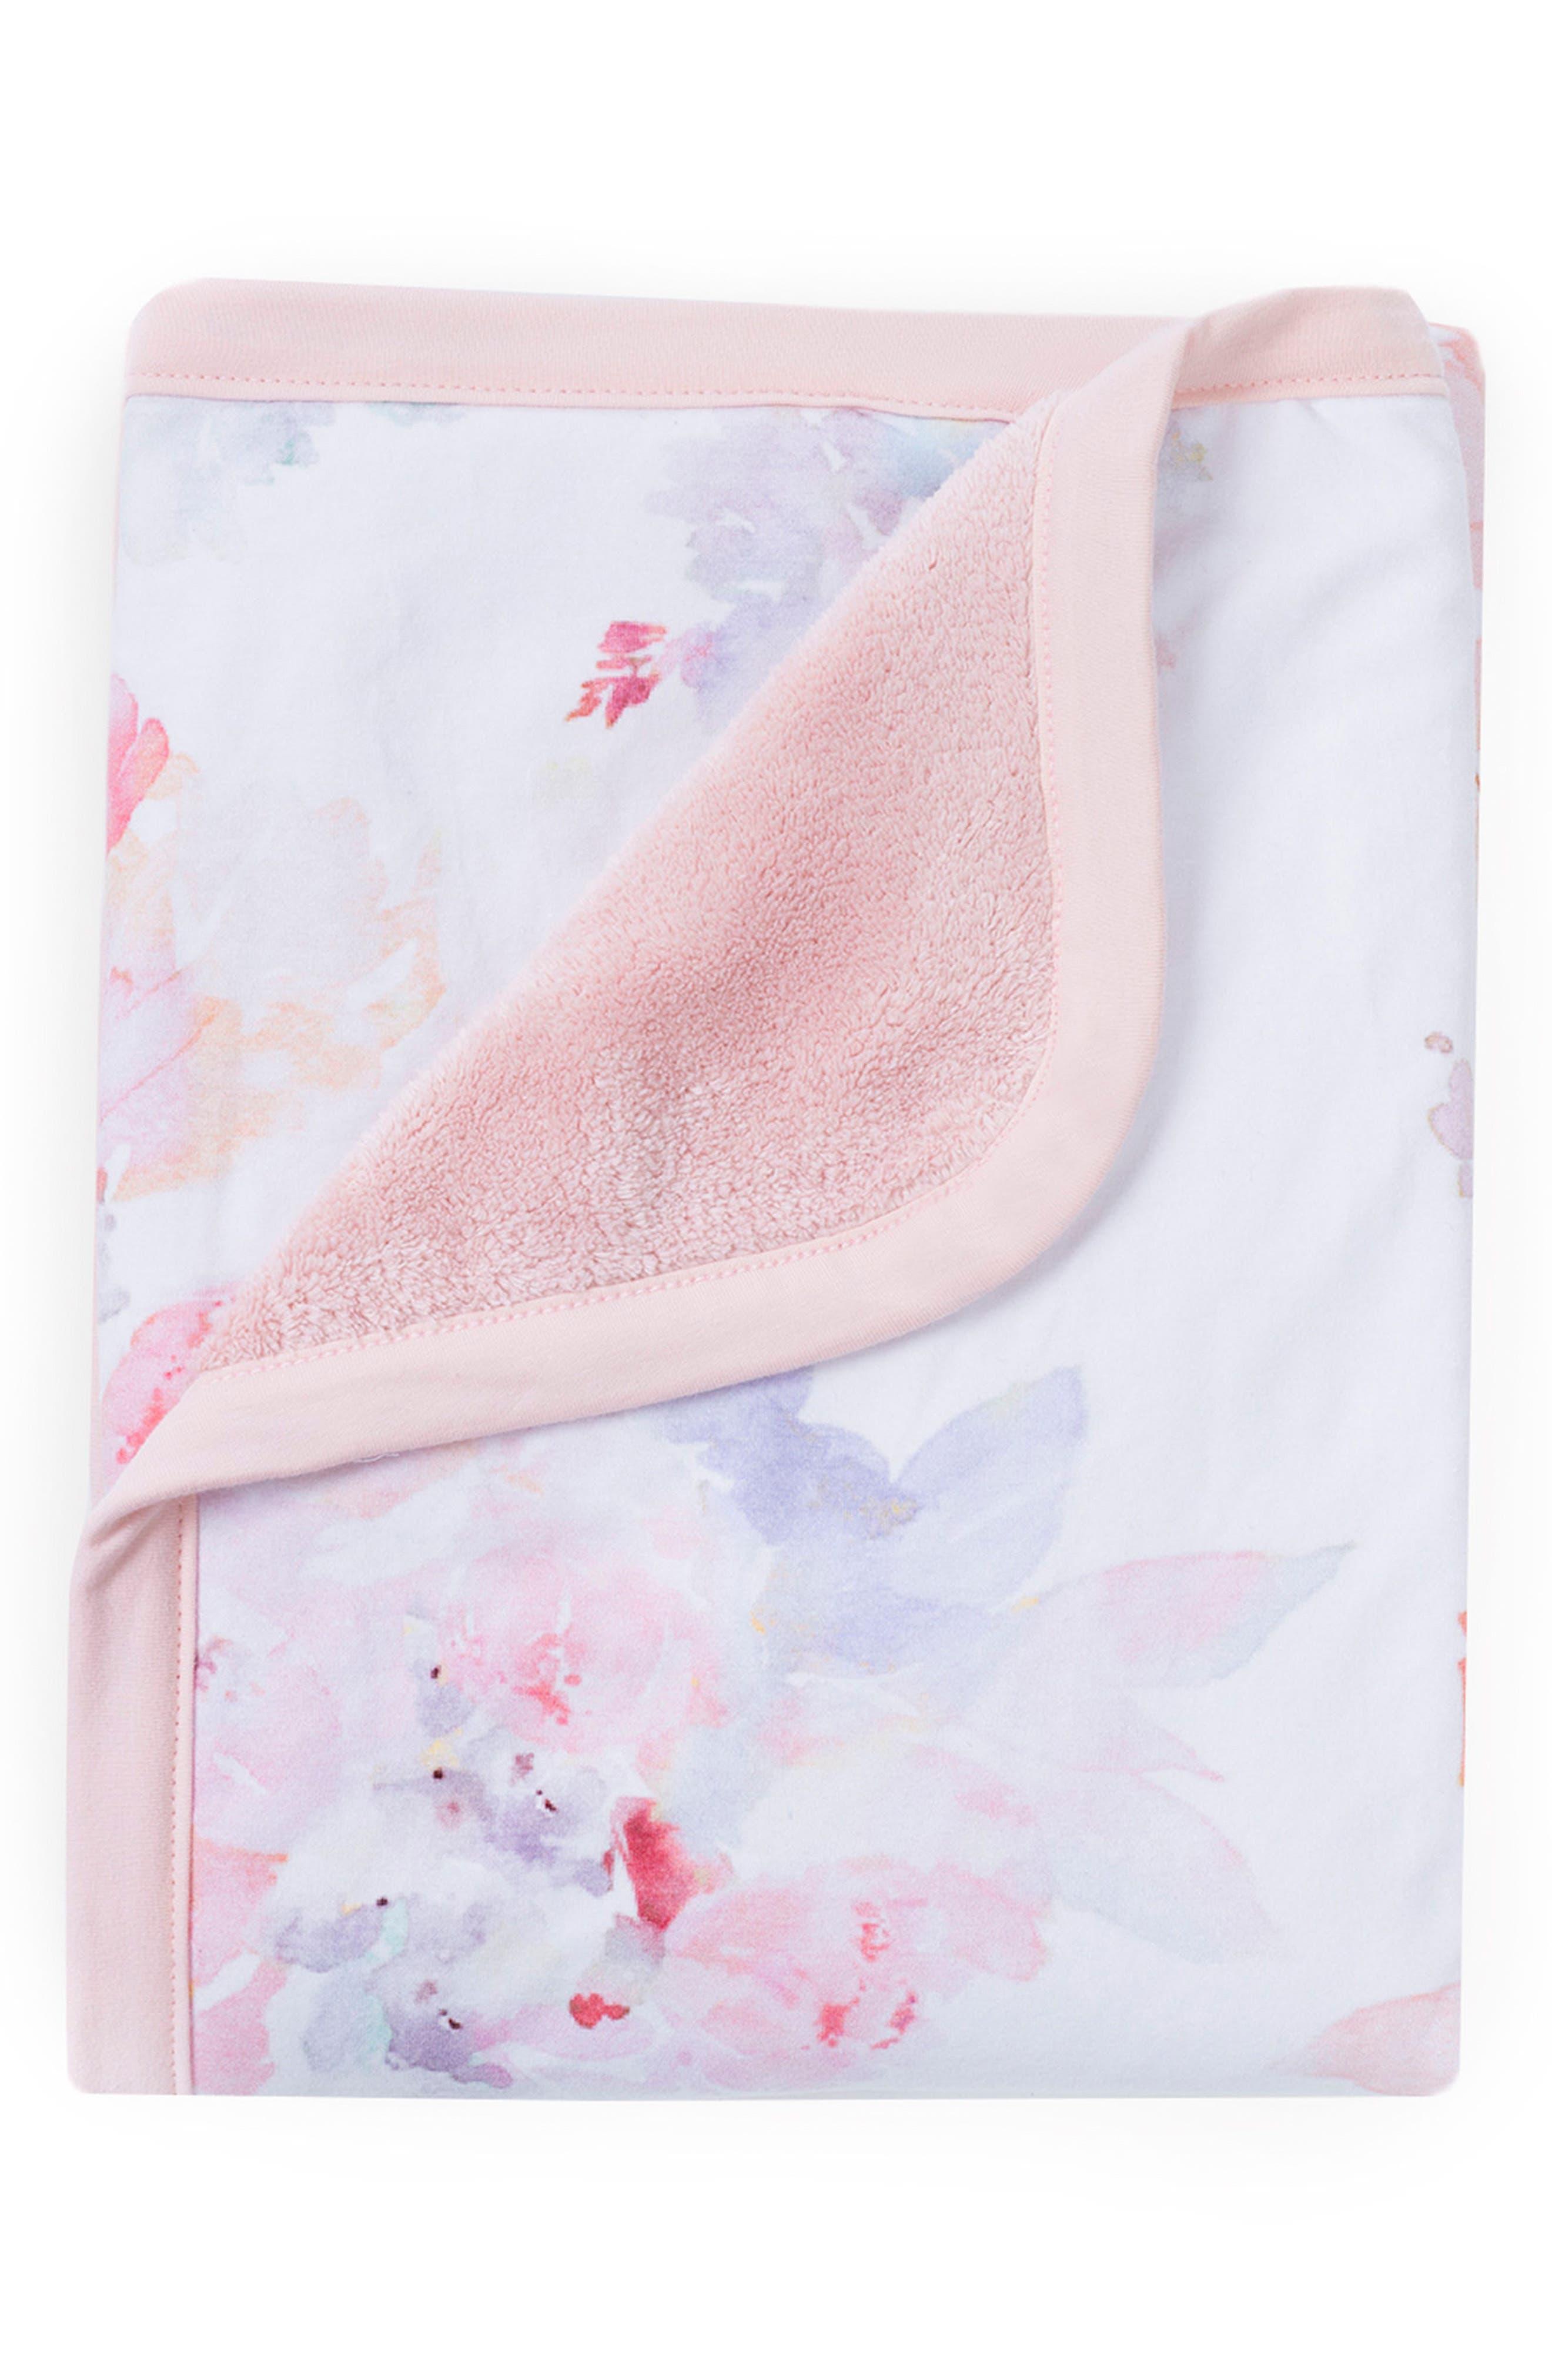 OILO, Prim Cuddle Blanket, Main thumbnail 1, color, PRIM